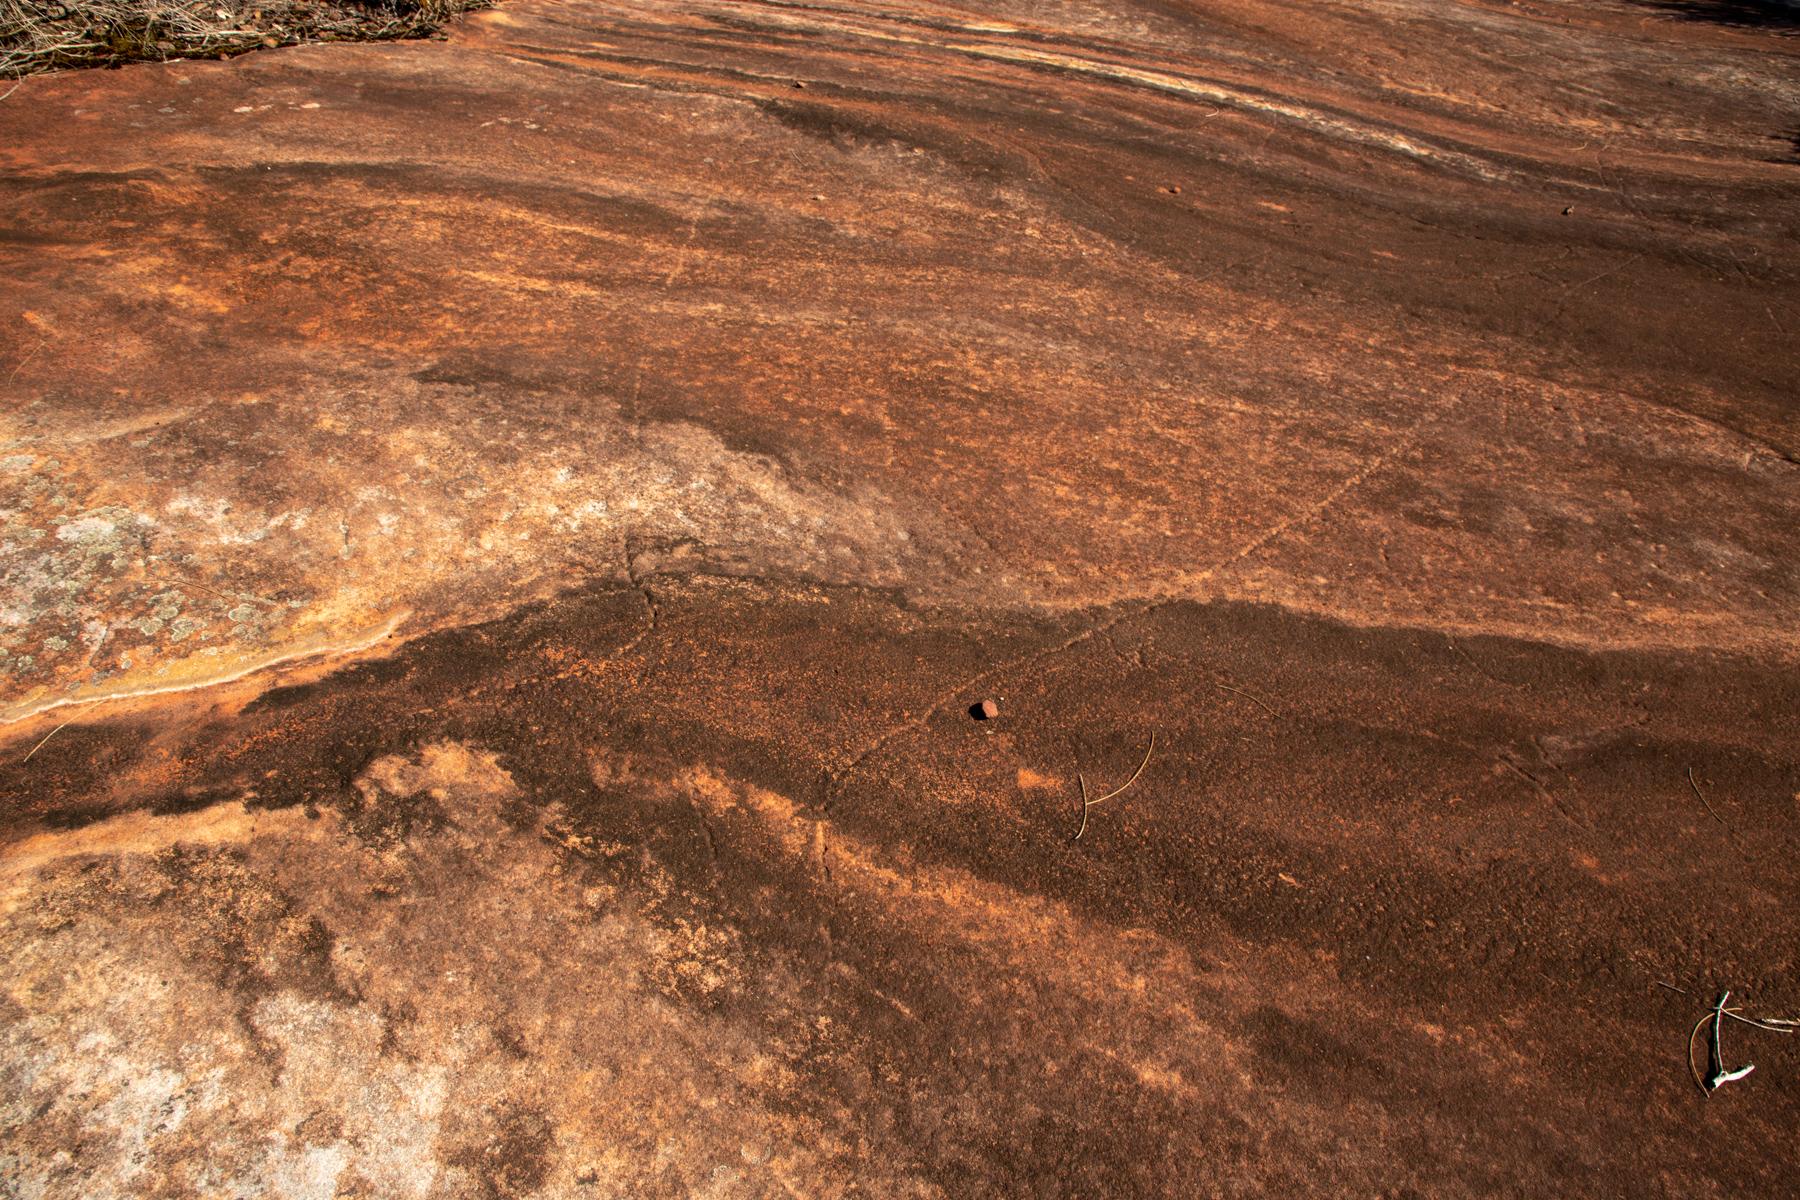 IMG 7603 LR Basin and Mackerel Track Aboriginal sites